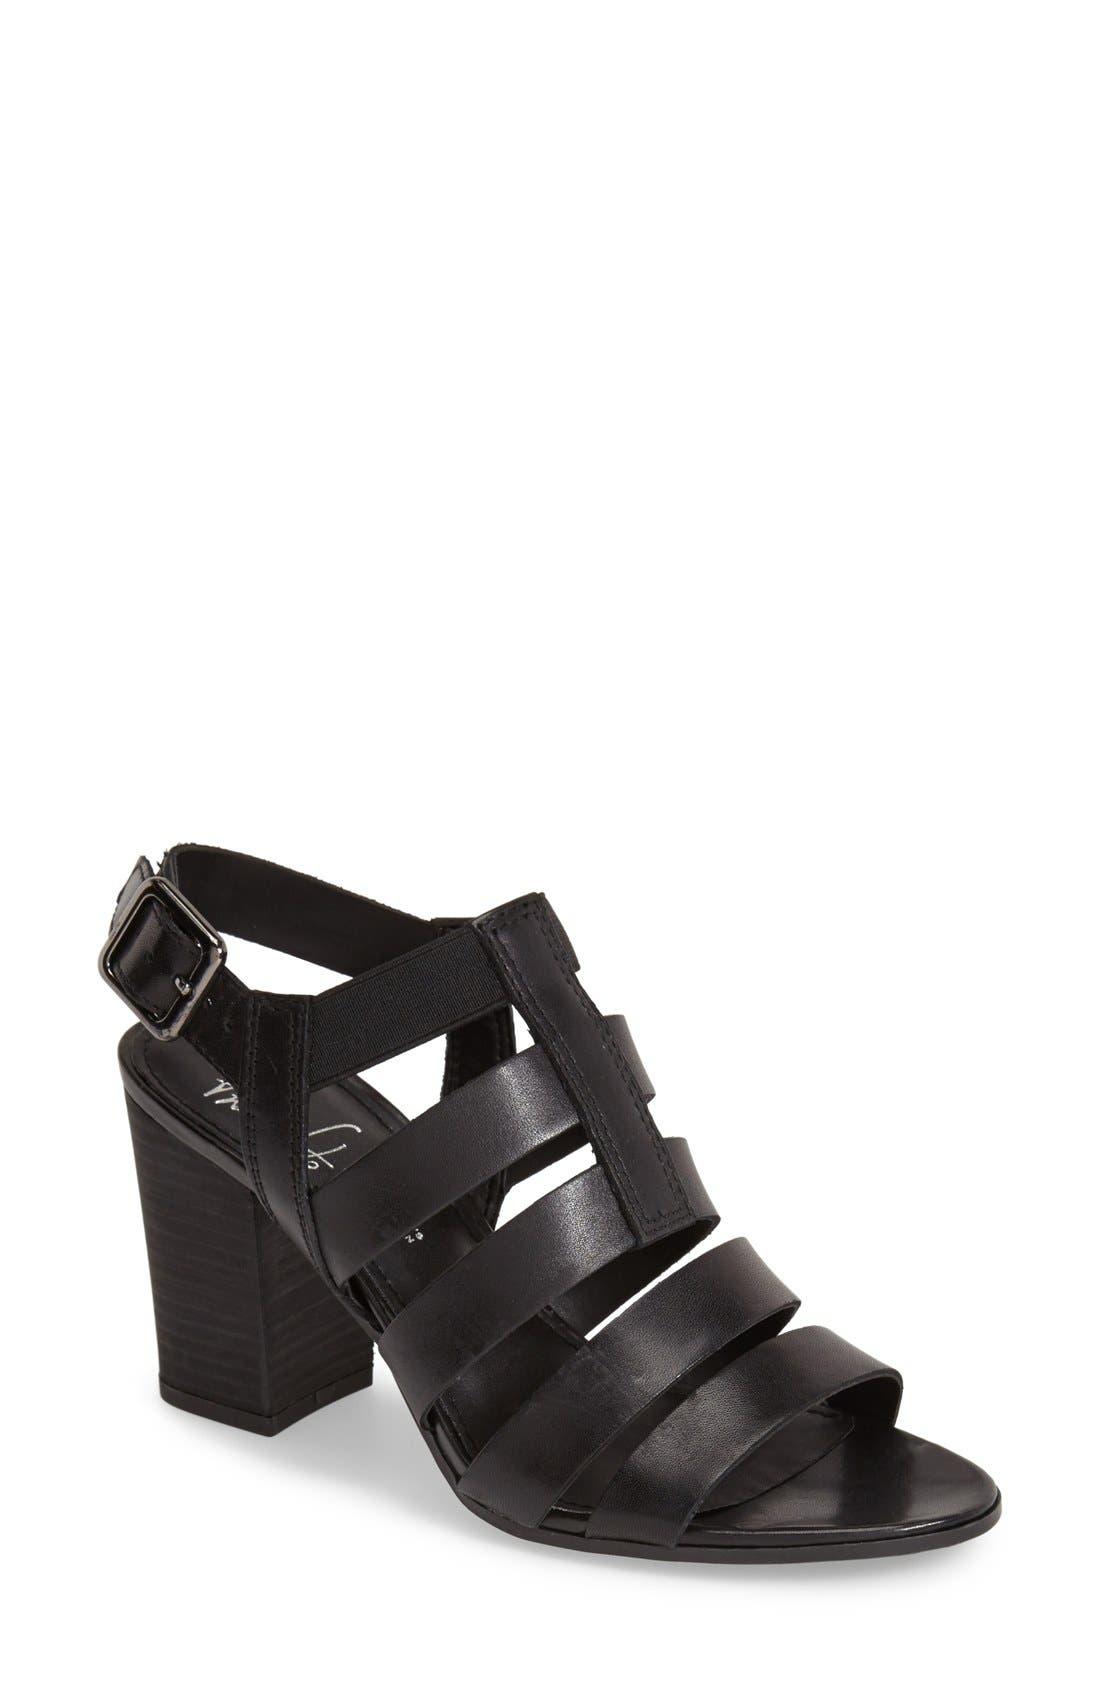 'Montage' Leather Sandal, Main, color, 001